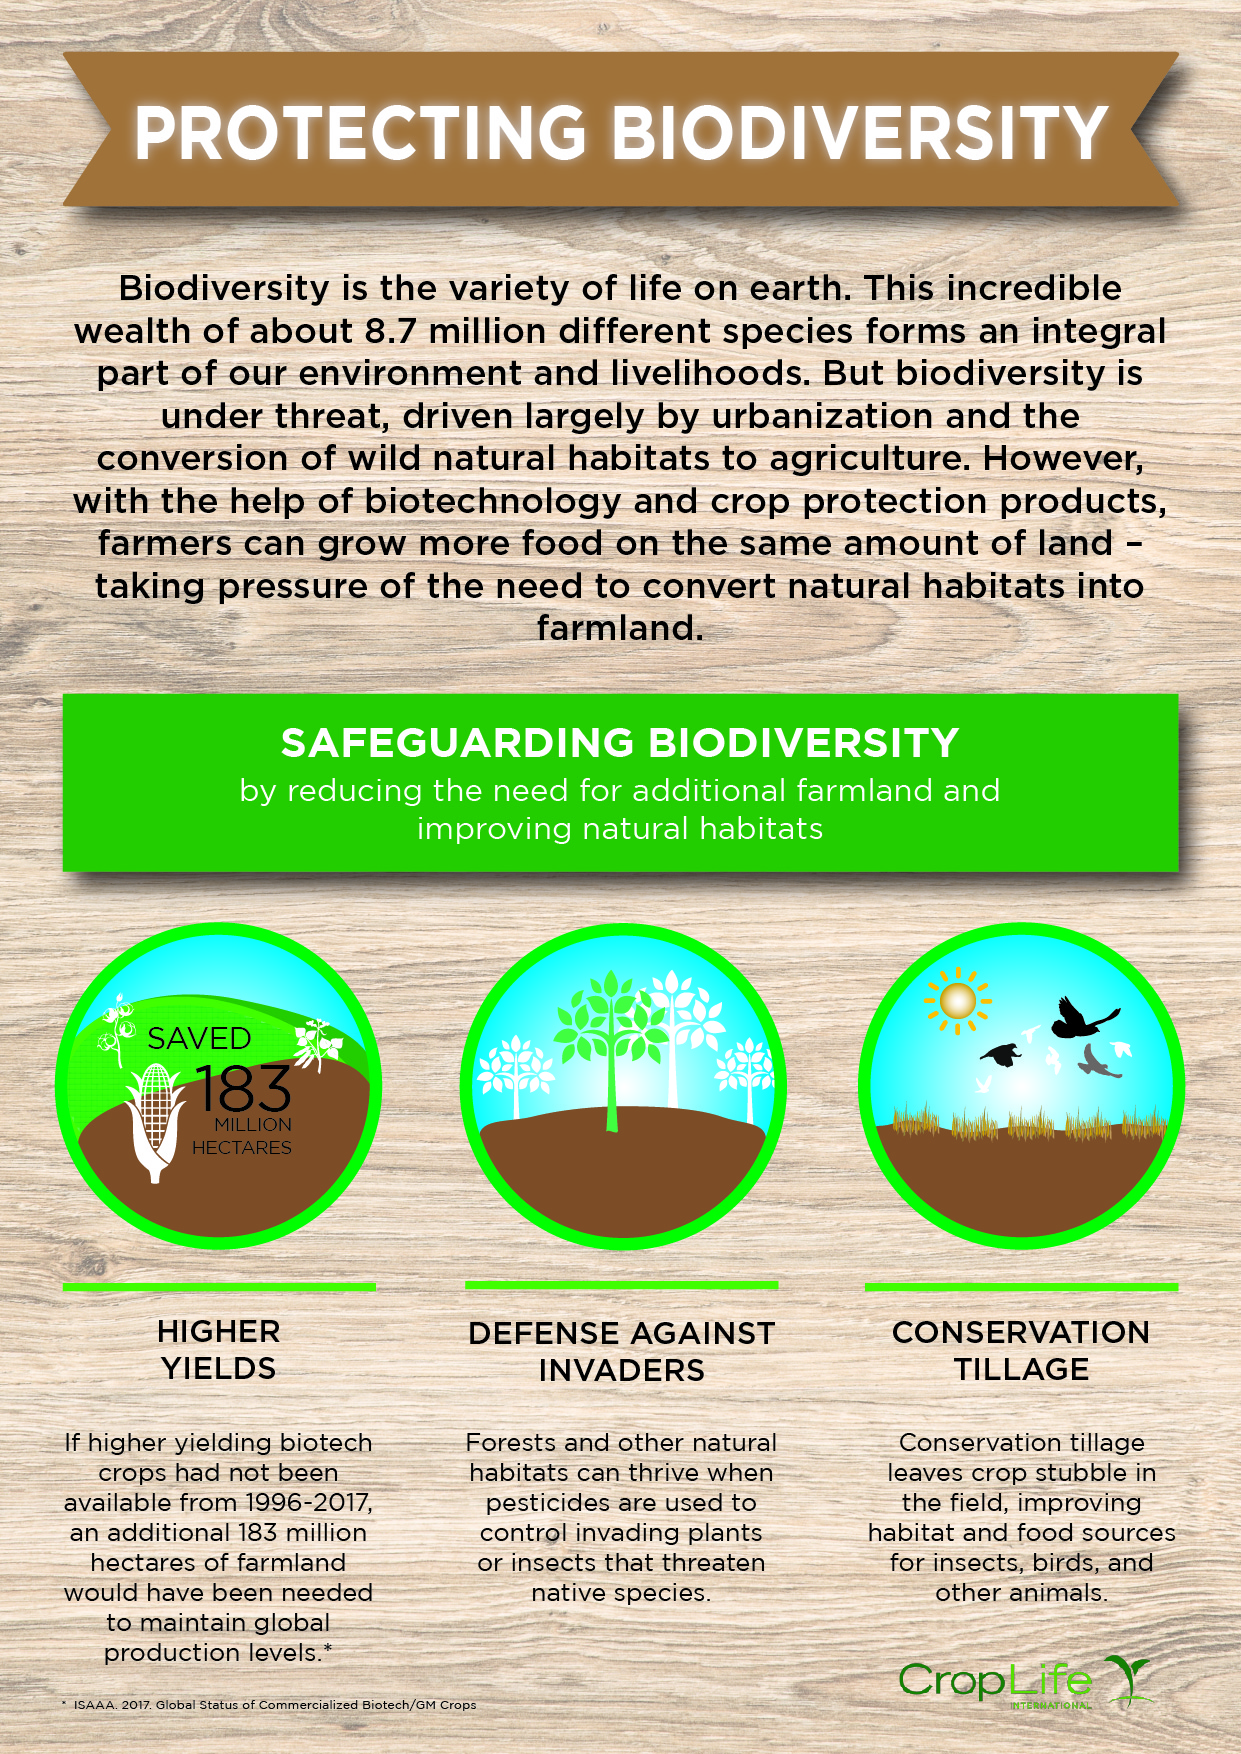 Safeguarding Biodiversity